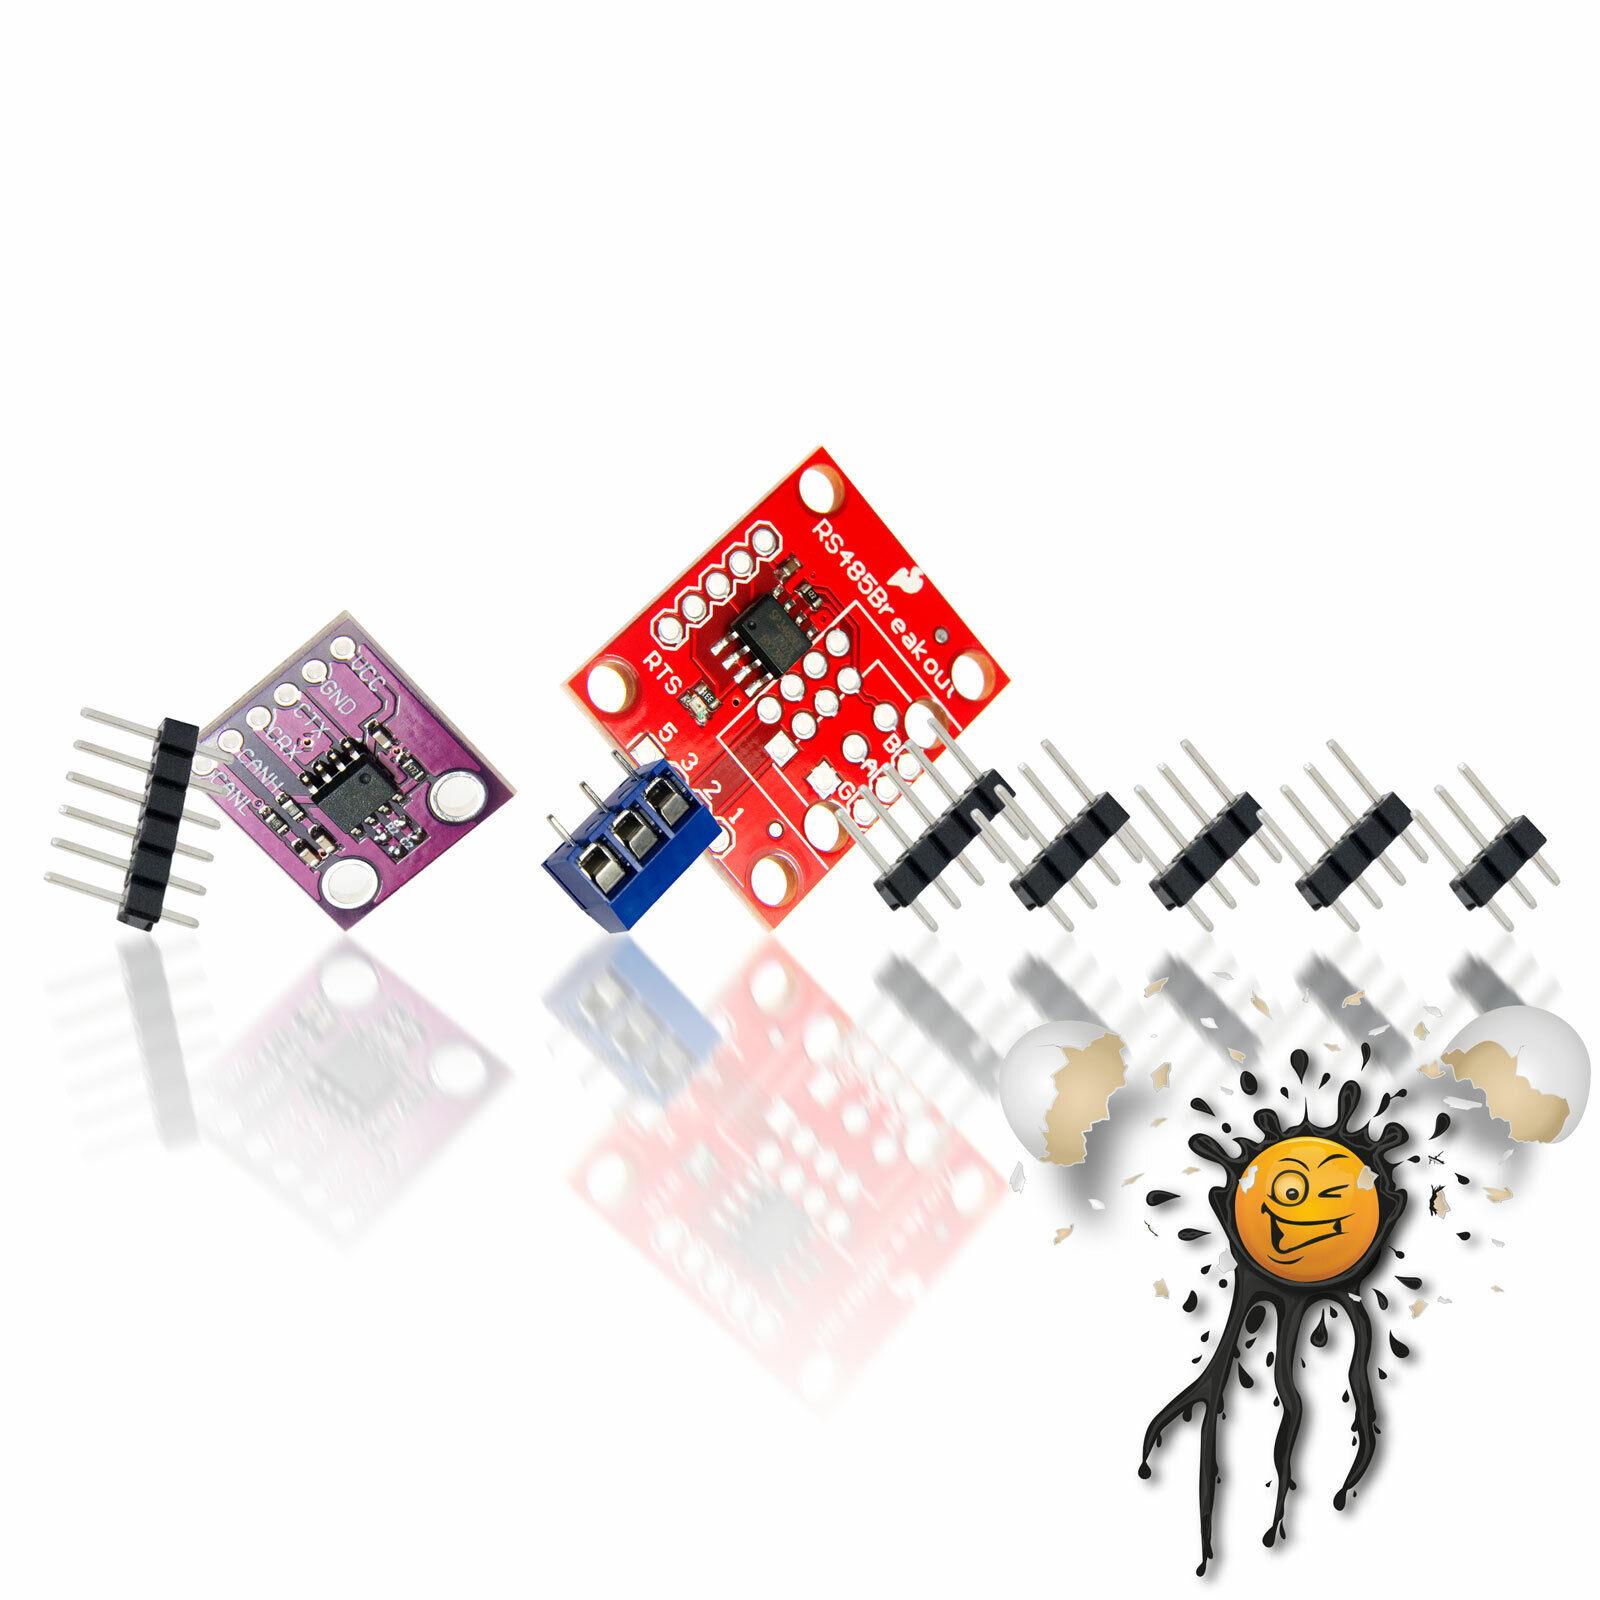 Rs485 rs422 max3485e epa0040 3-3,6v Half Duplex rs485 to rs232 l/'UART DIP 8 IC